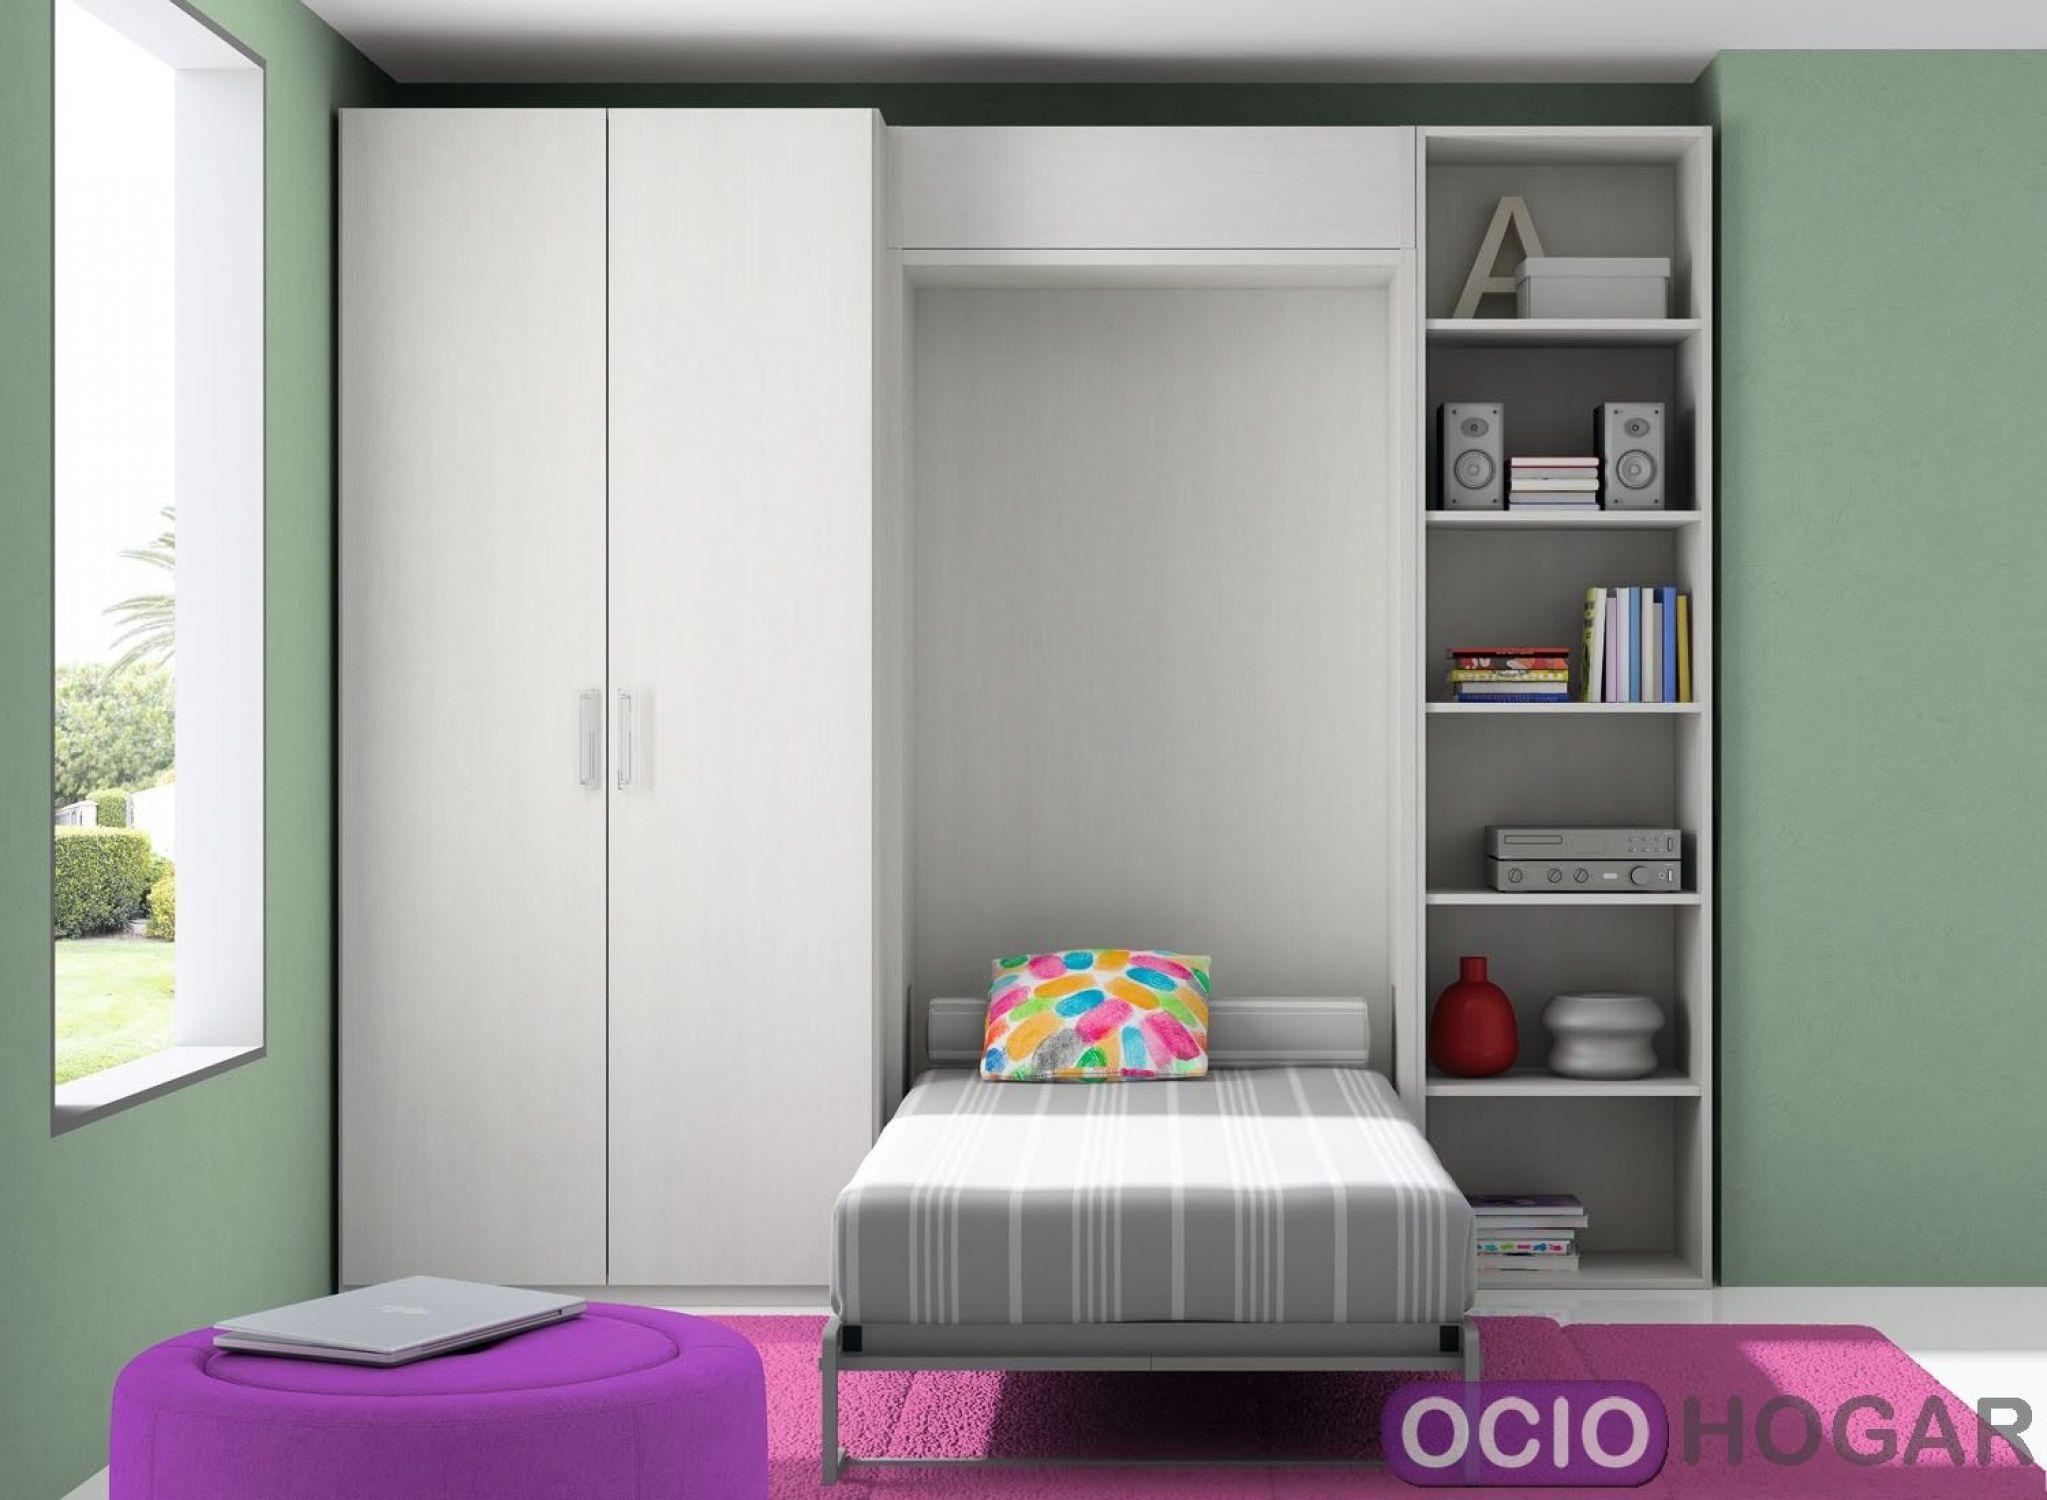 Dormitorio infantil closet de dissery muebles juveniles for Muebles juveniles modernos